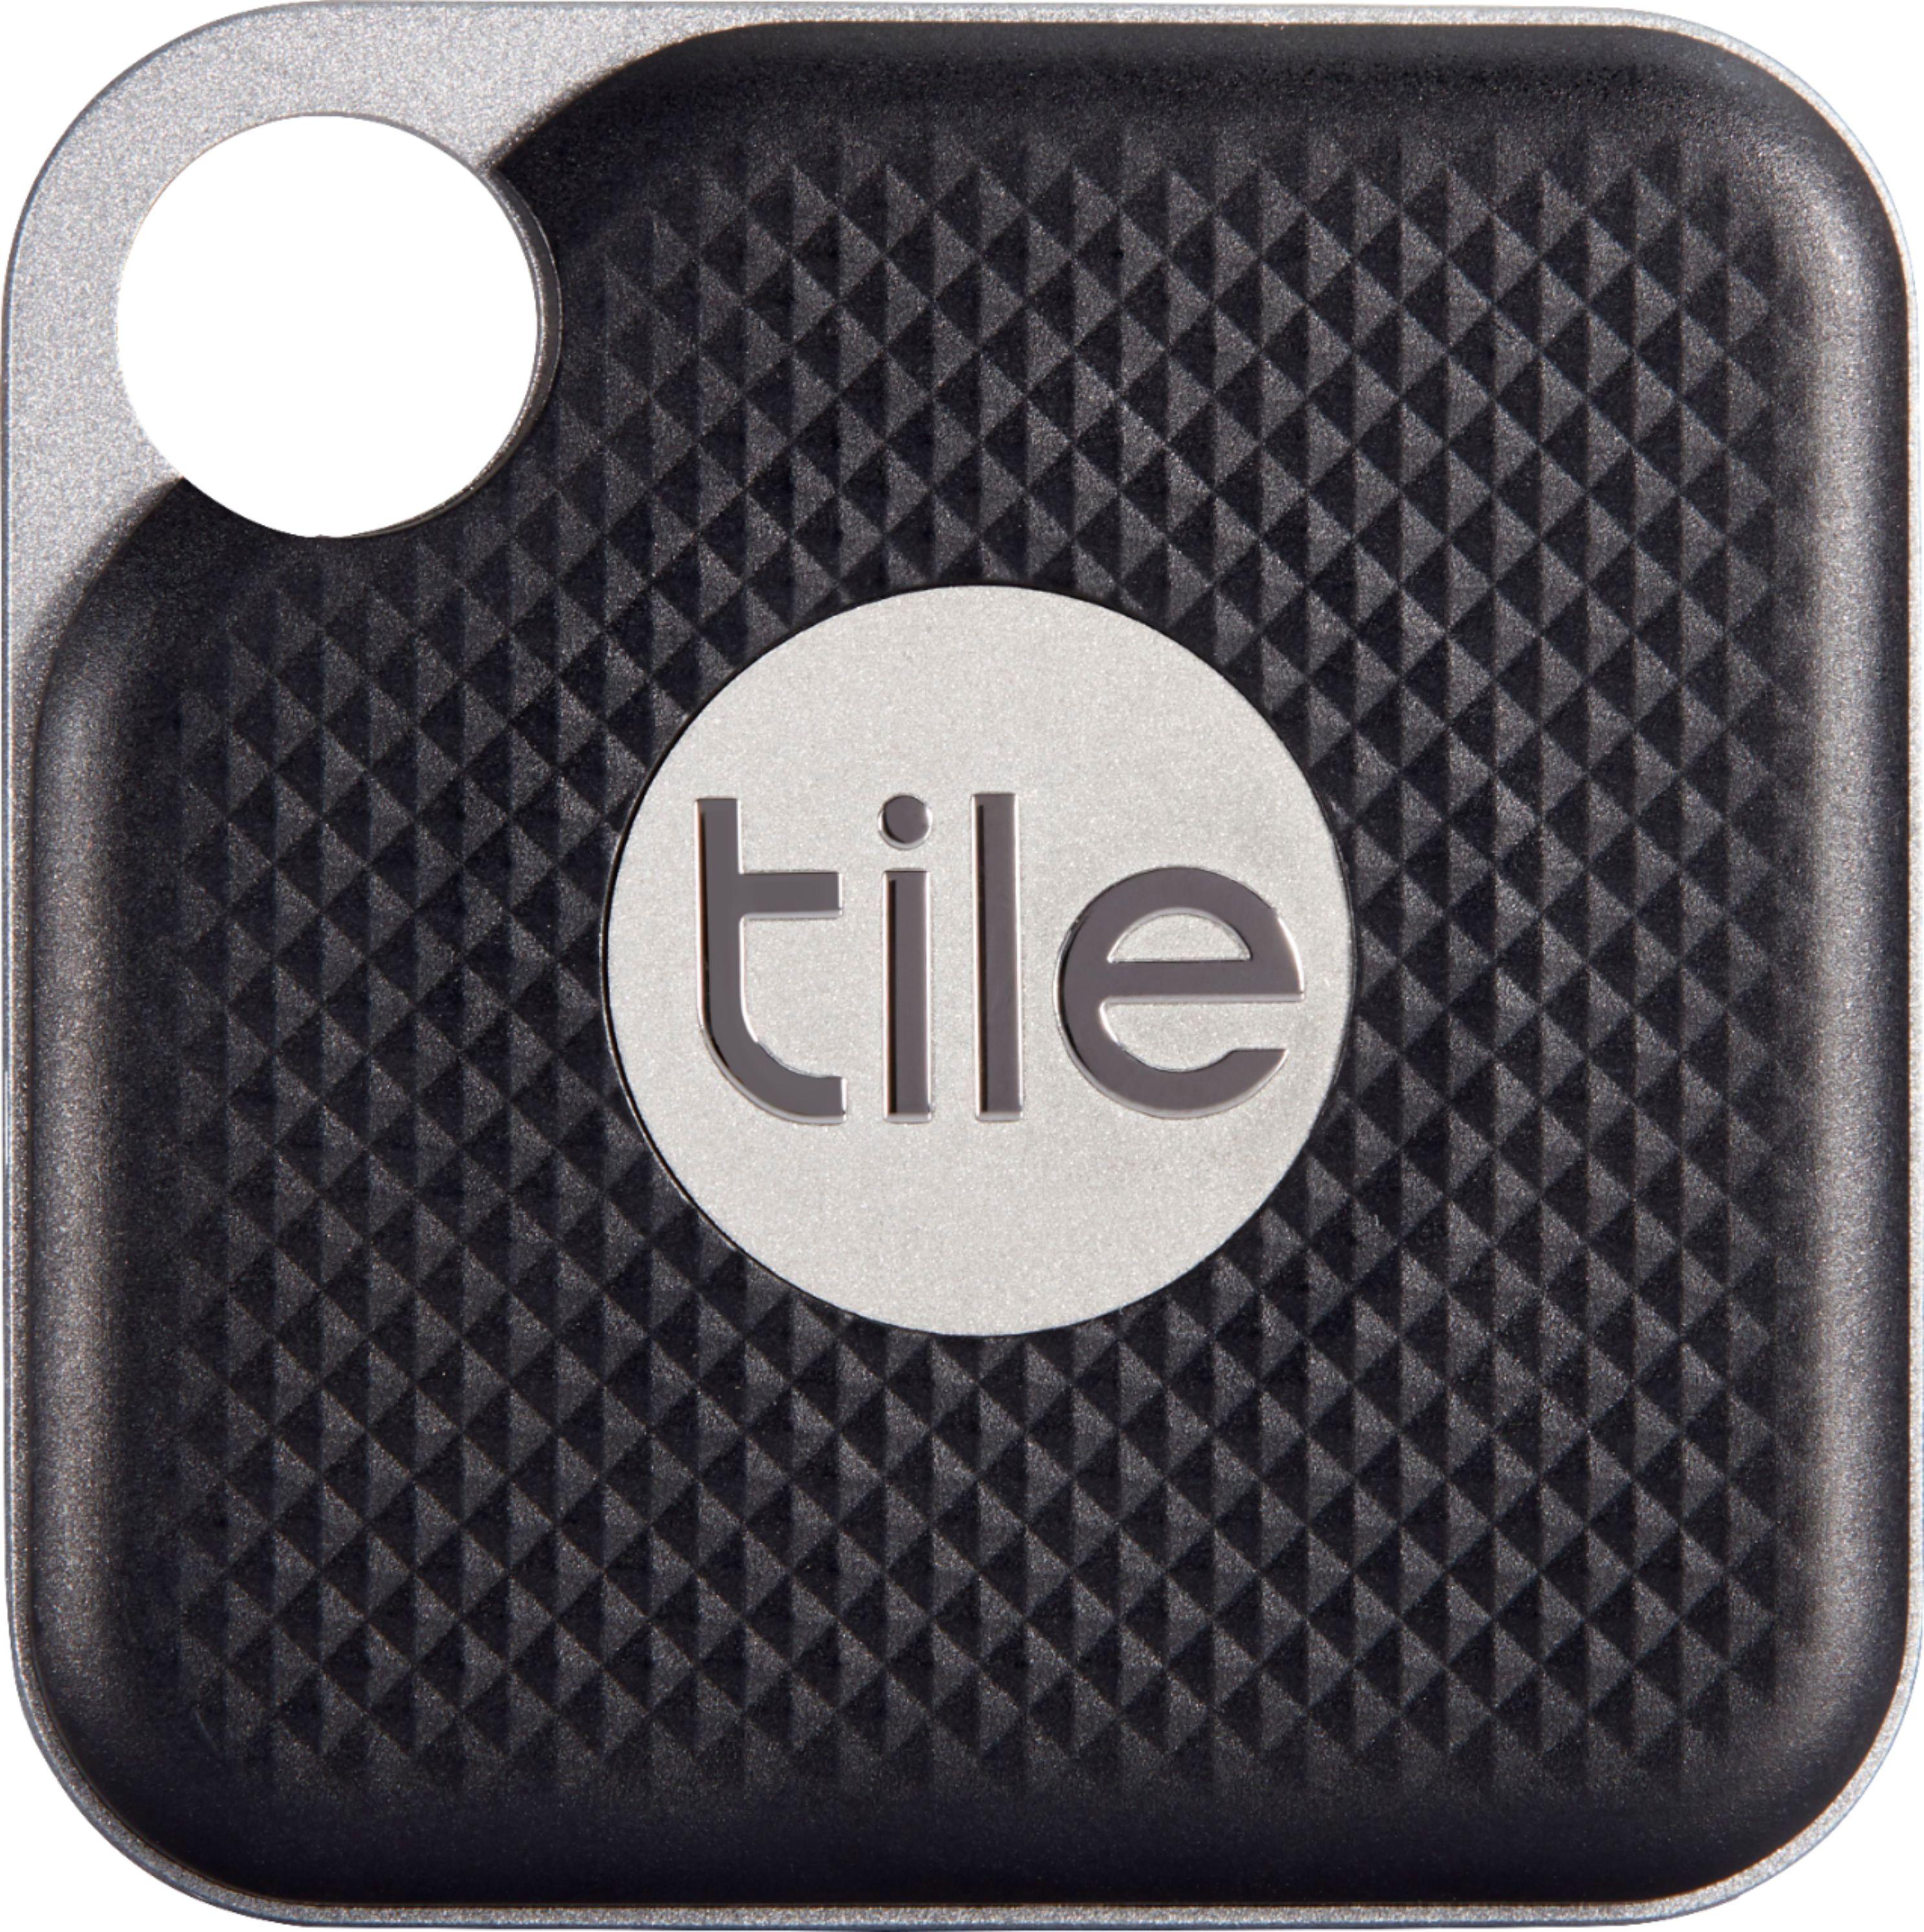 tile pro 2018 item tracker jet black graphite